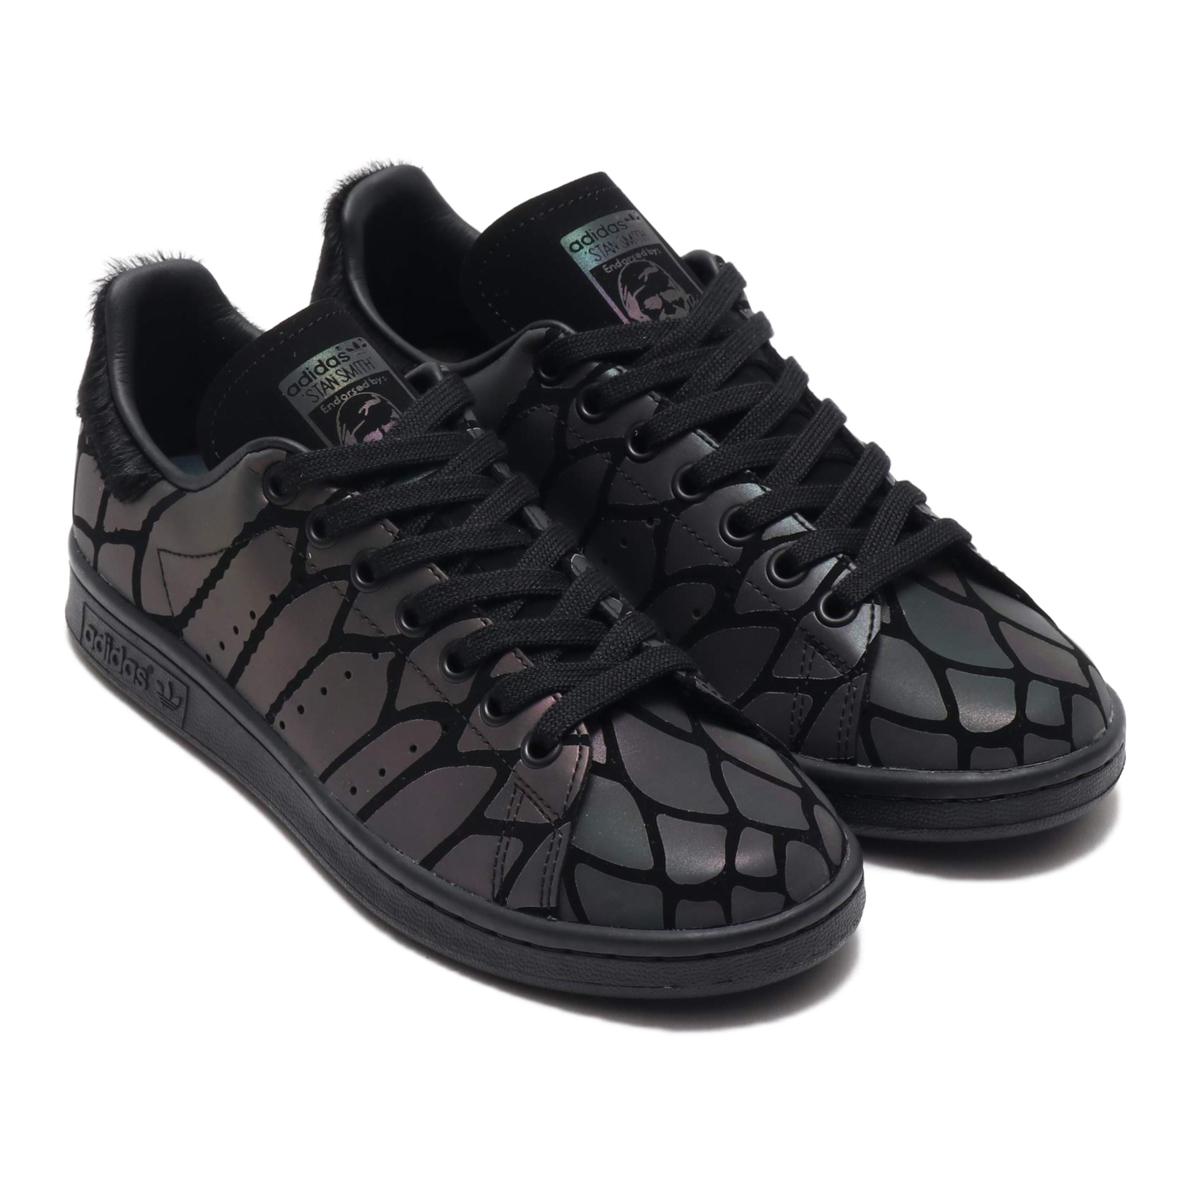 adidas STAN SMITH W(アディダス スタンスミス W)CORE BLACK/CORE BLACK/CORE BLACK【メンズ レディース スニーカー】19FW-S